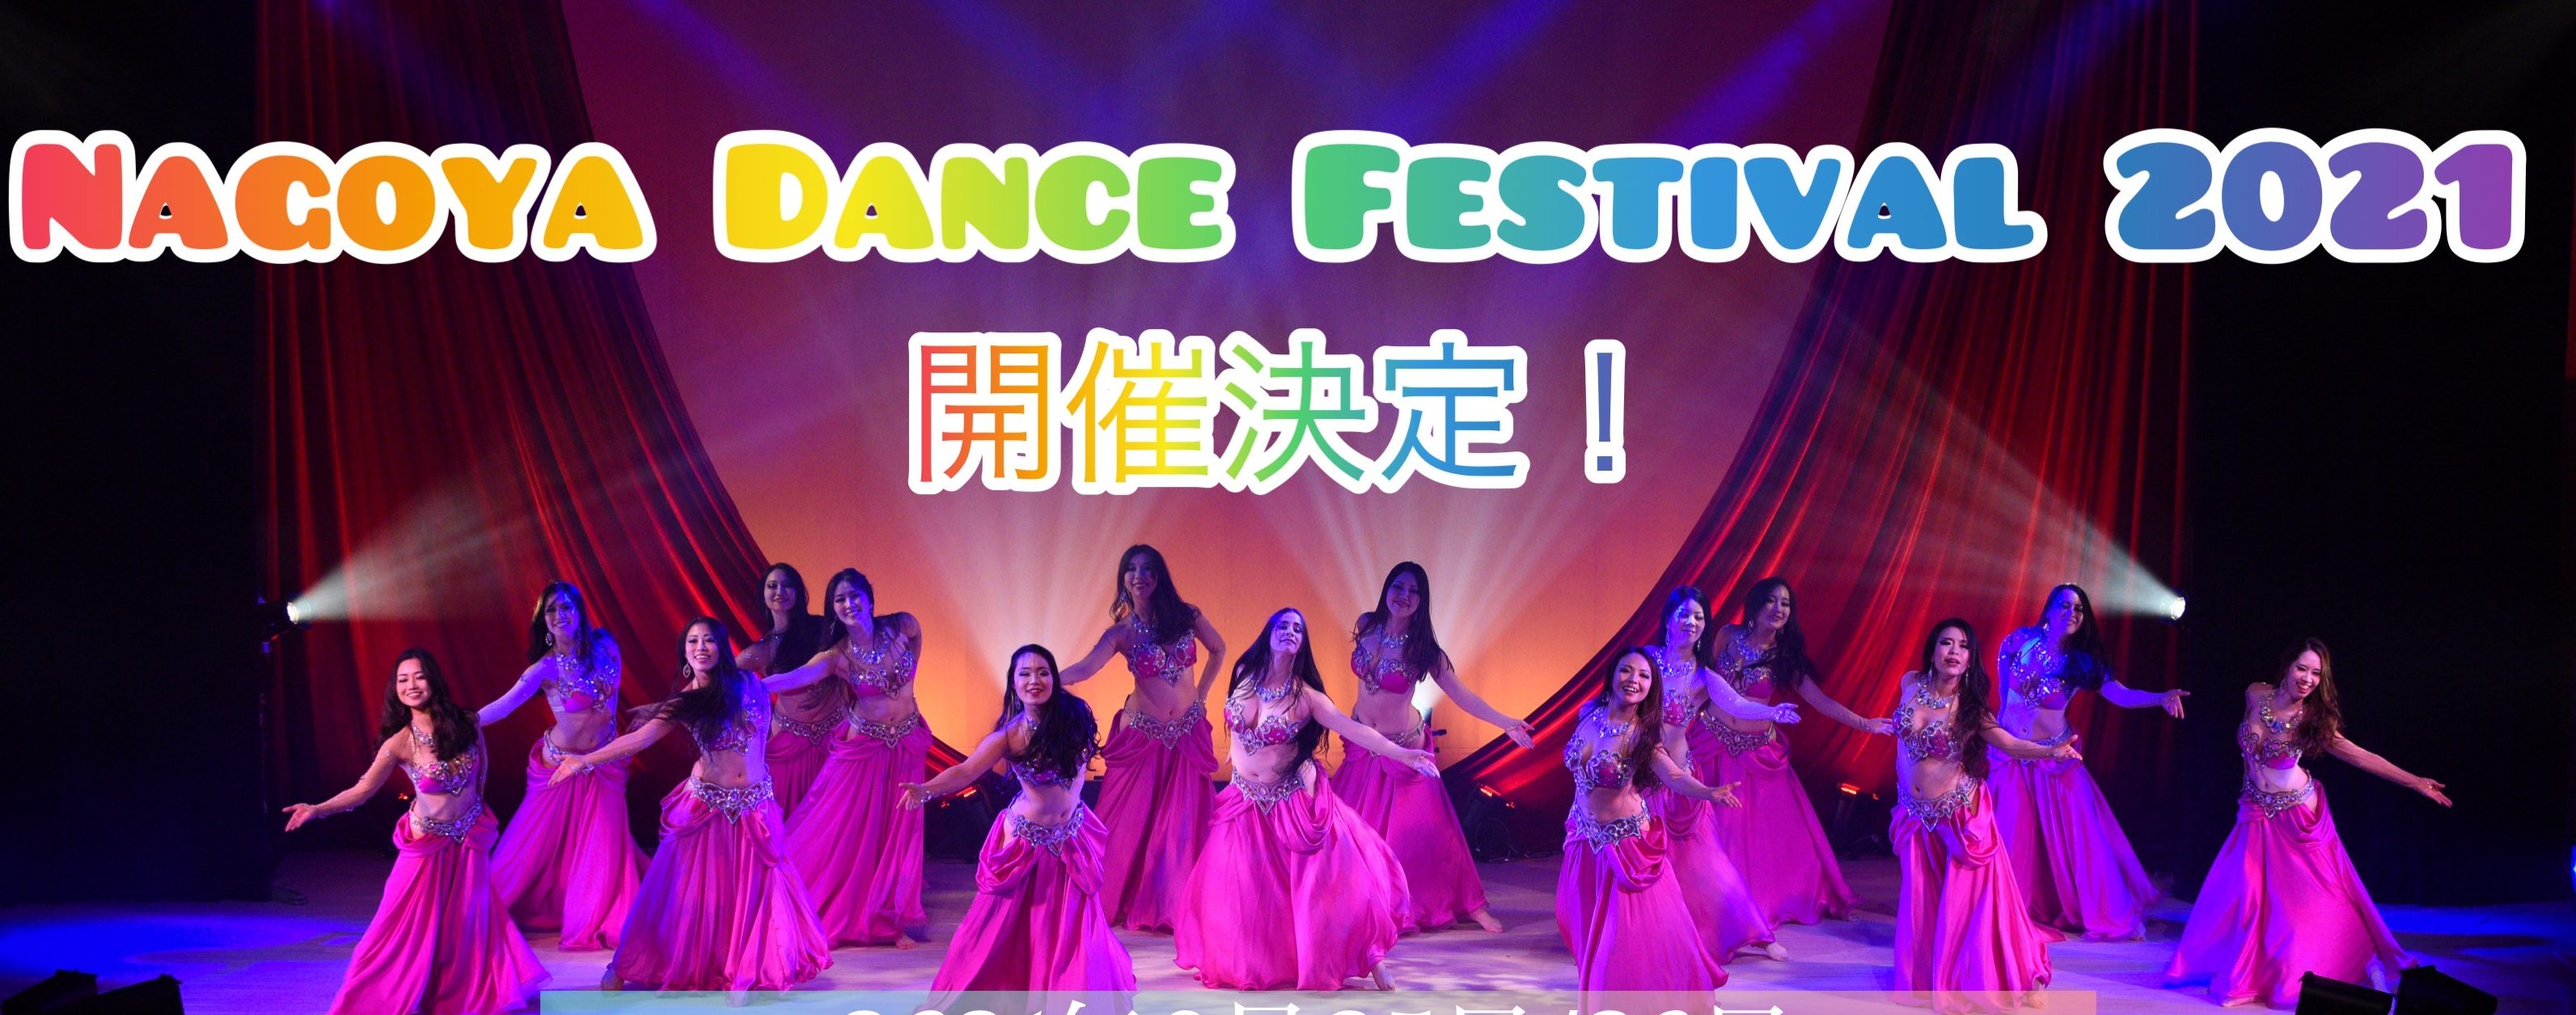 ★Nagoya Dance Festival2021プログラム発表★